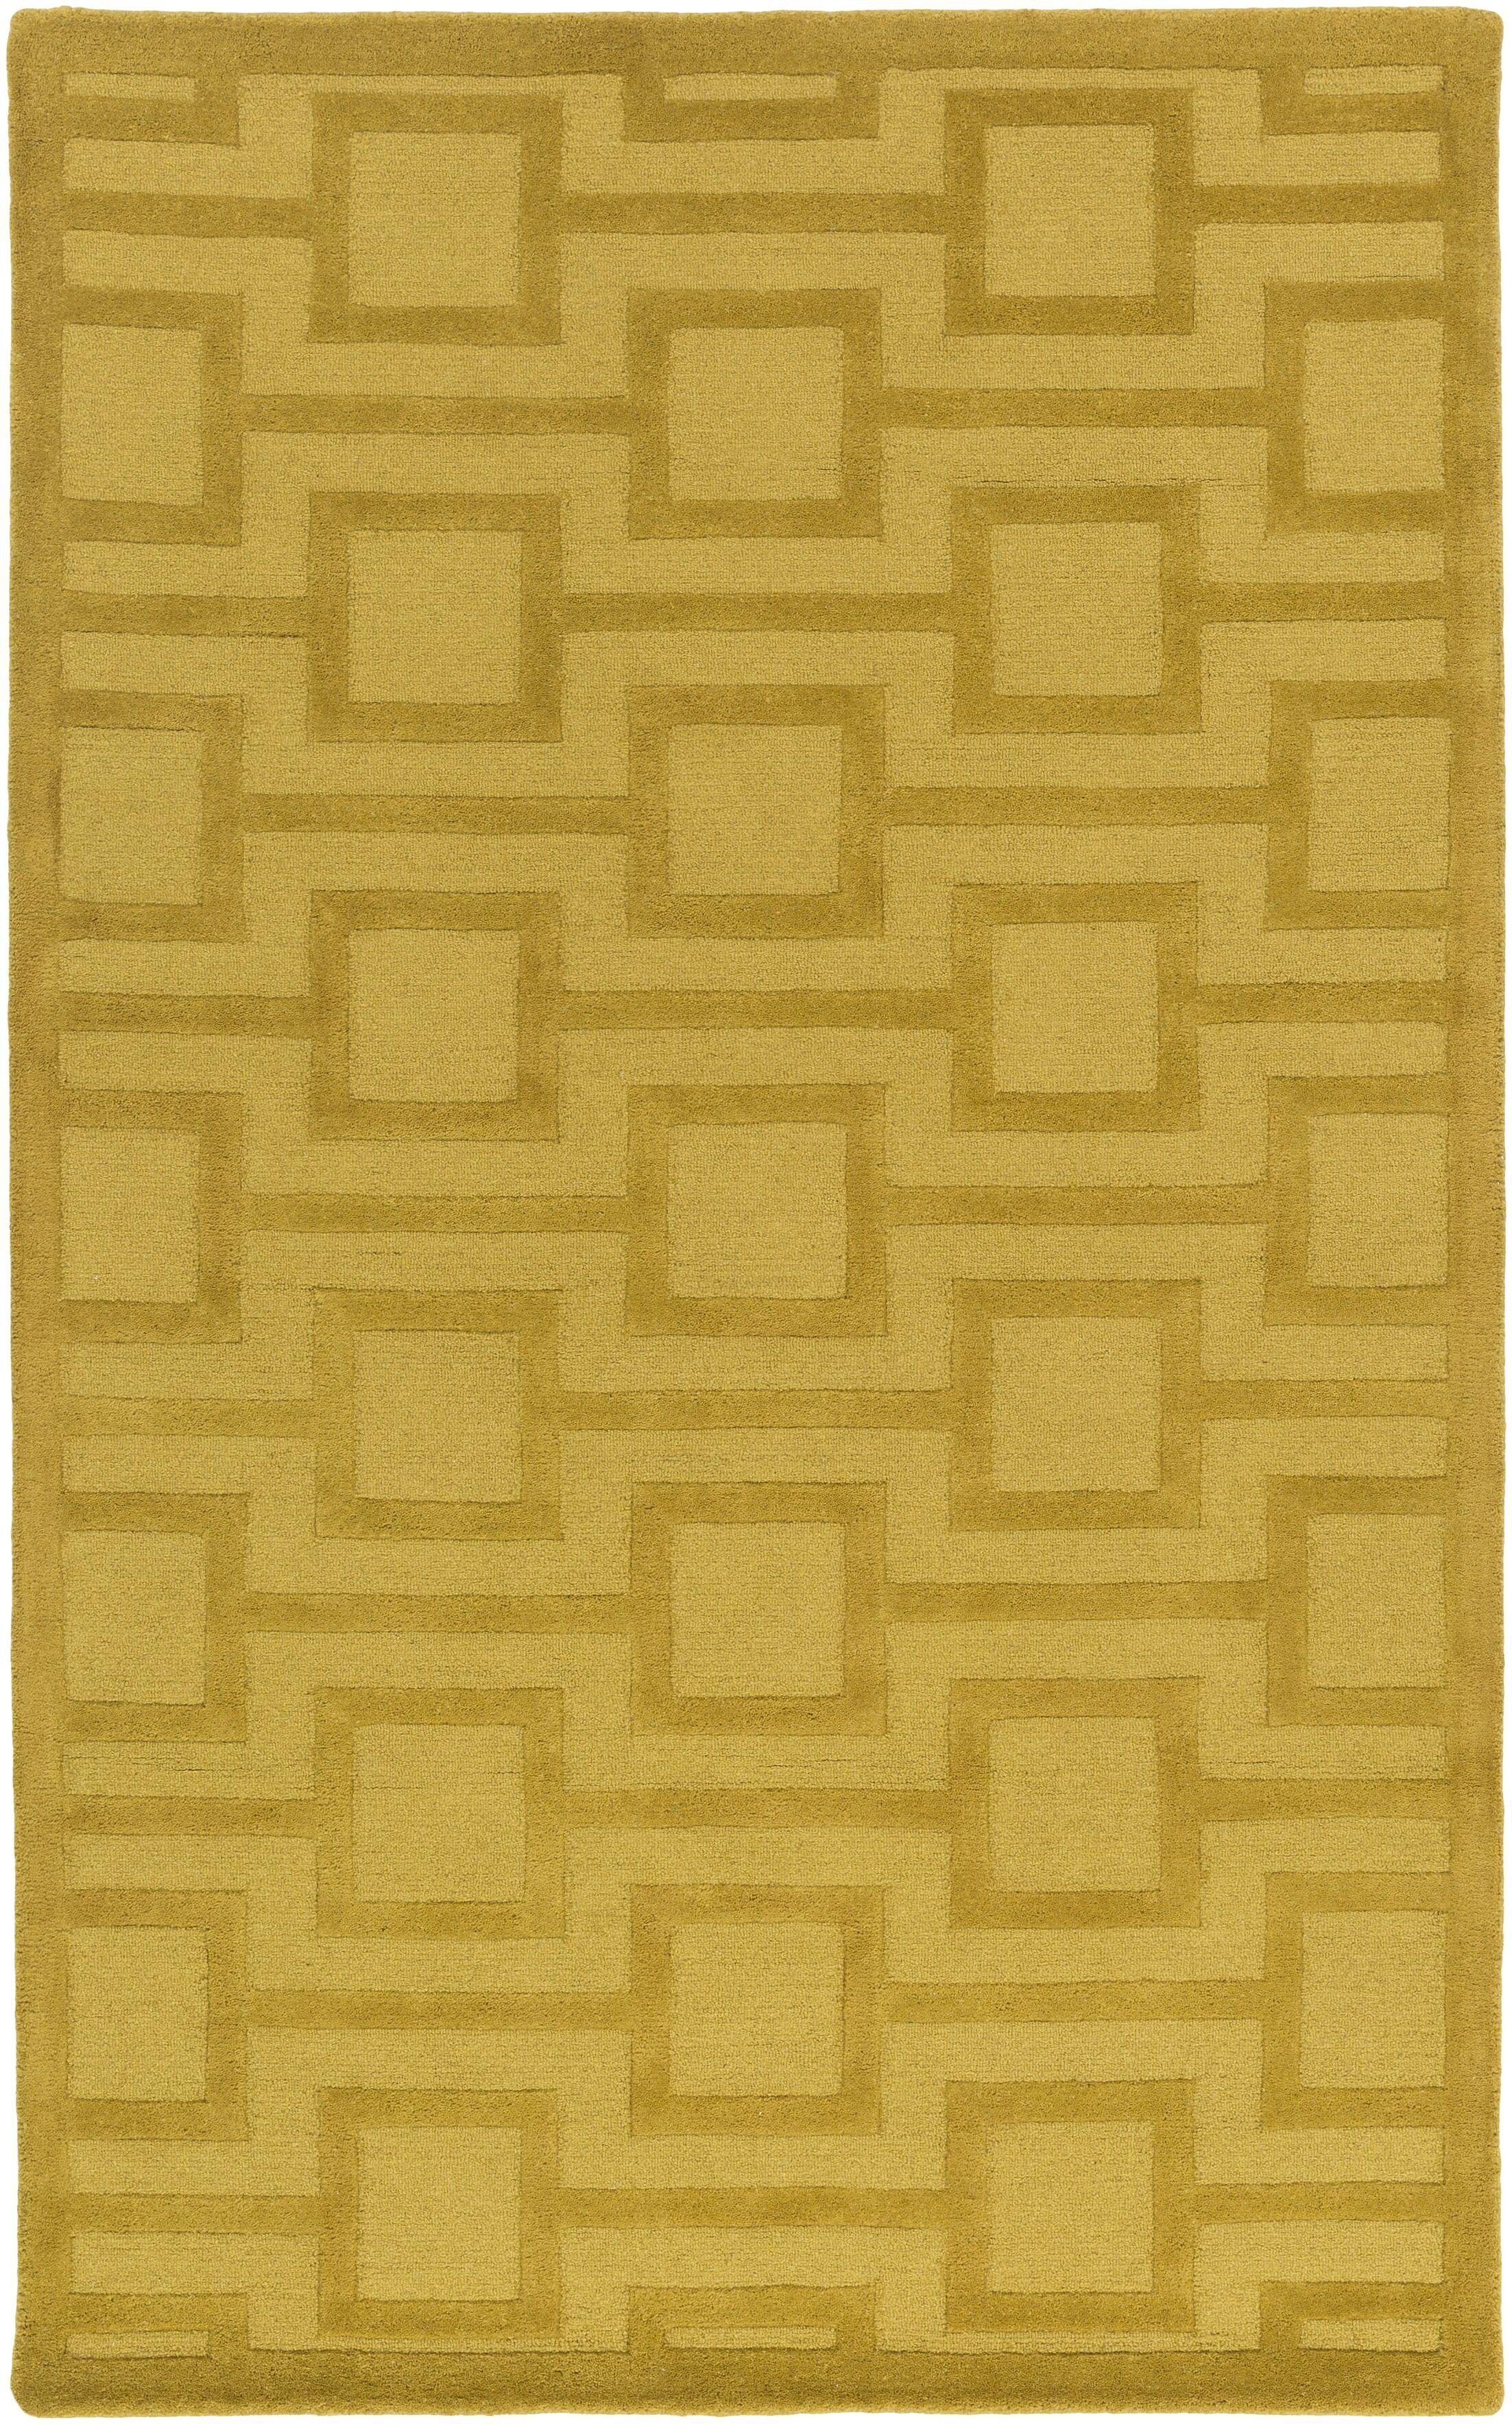 Sarai Hand-Tufted Gold Area Rug Rug Size: Rectangle 5' x 8'